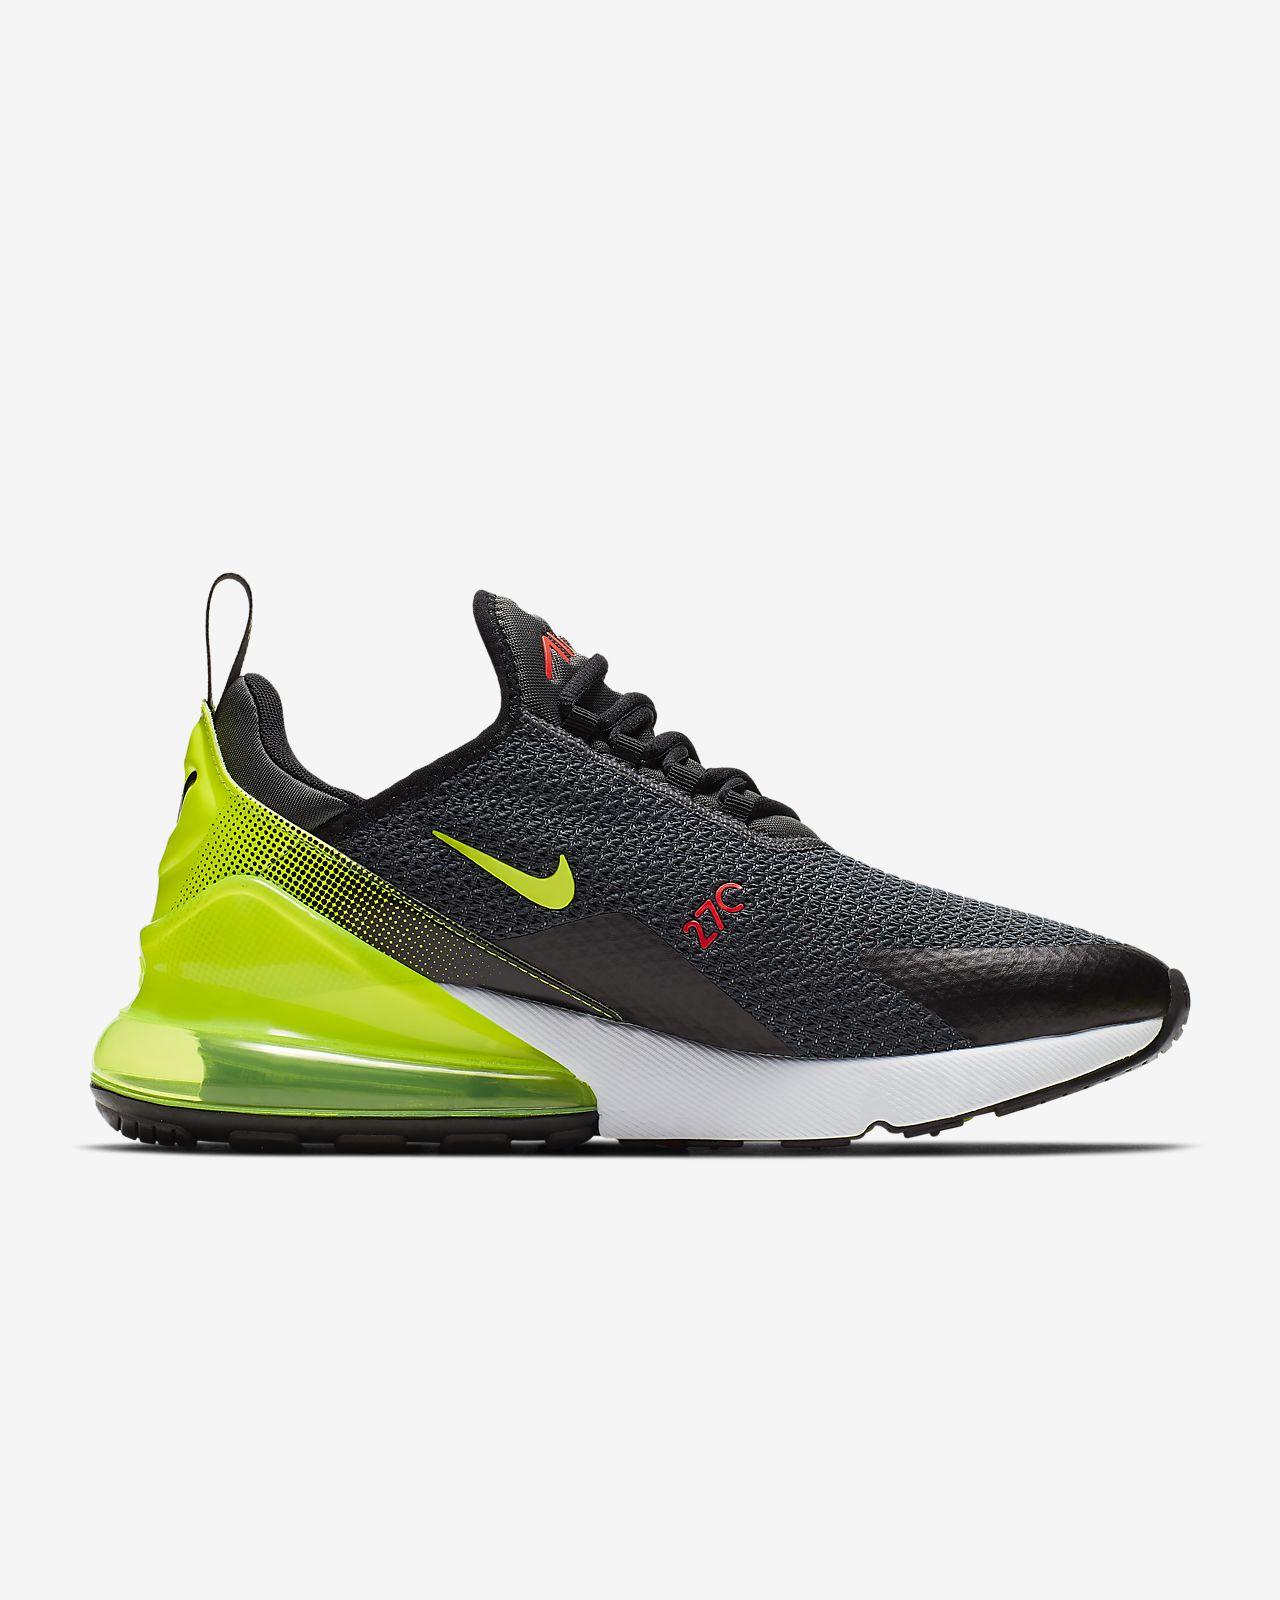 Nike Air Max 270 SE Sneaker Damen F100 |Lifestyle | Freizeit